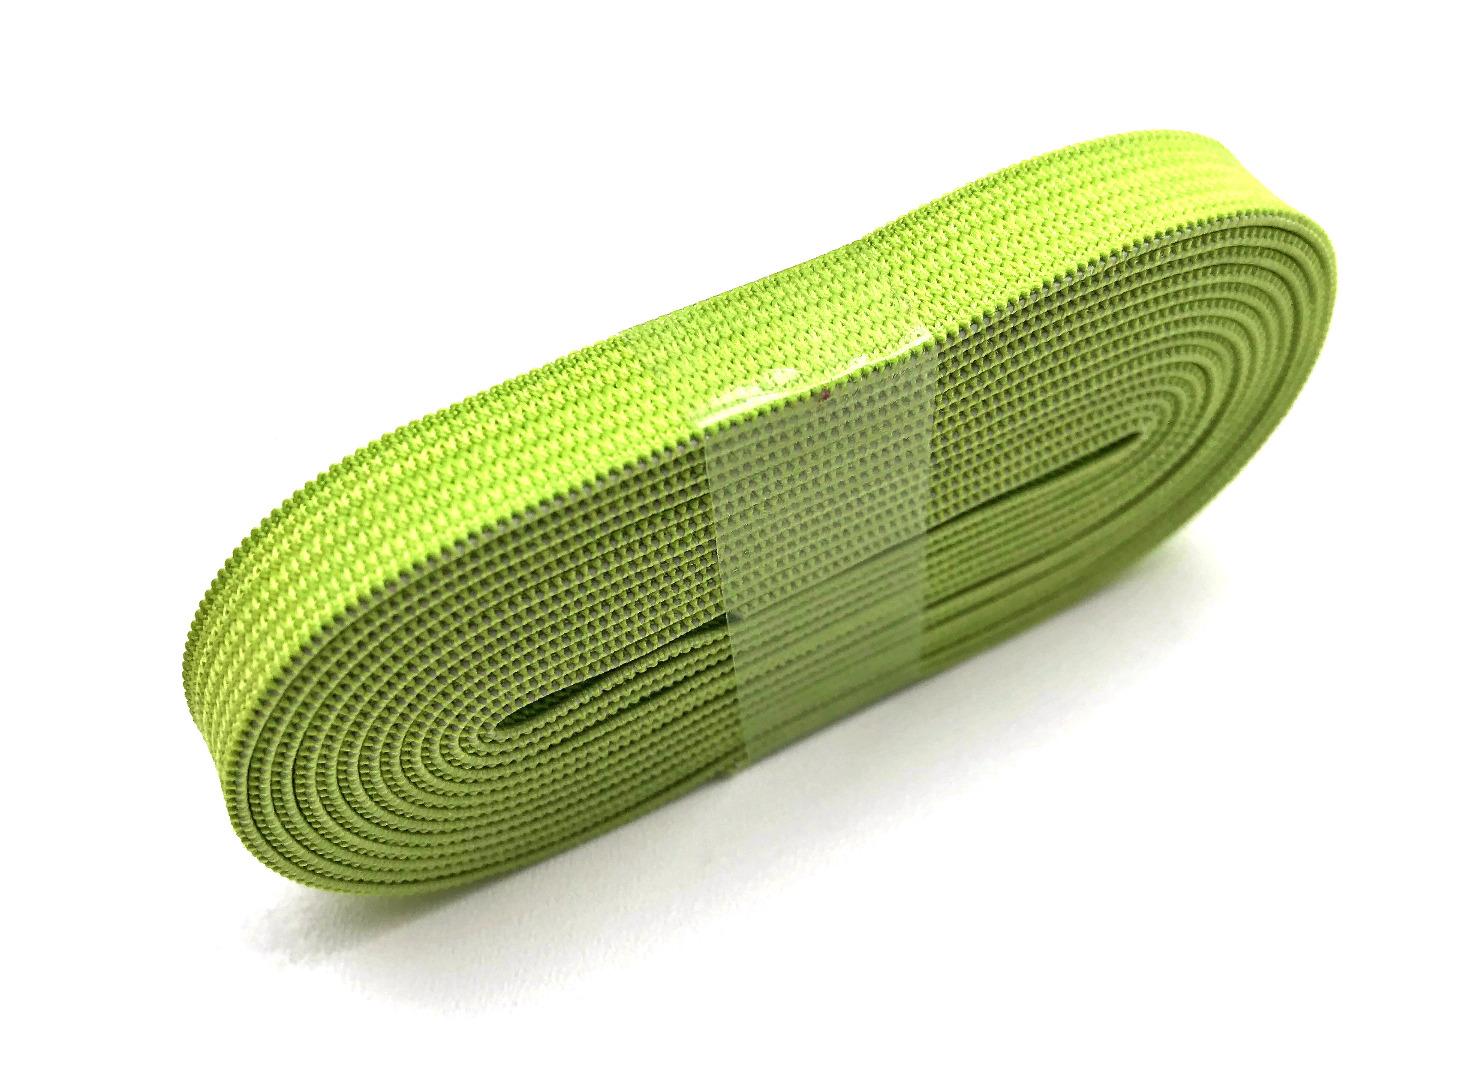 2m Gummiband hellgrün - 1 cm